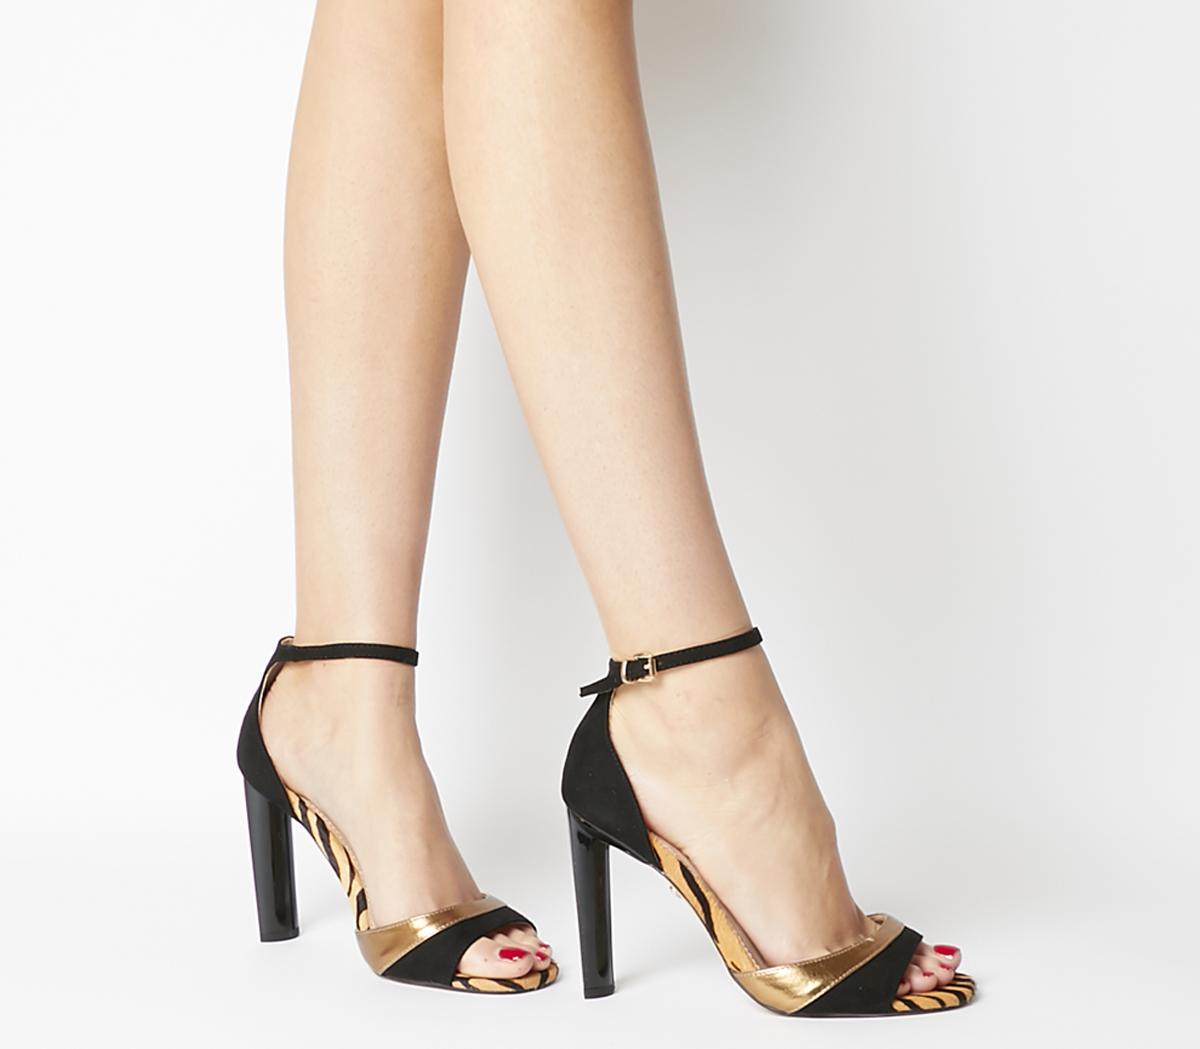 Hila Wf Ankle Strap Sandals